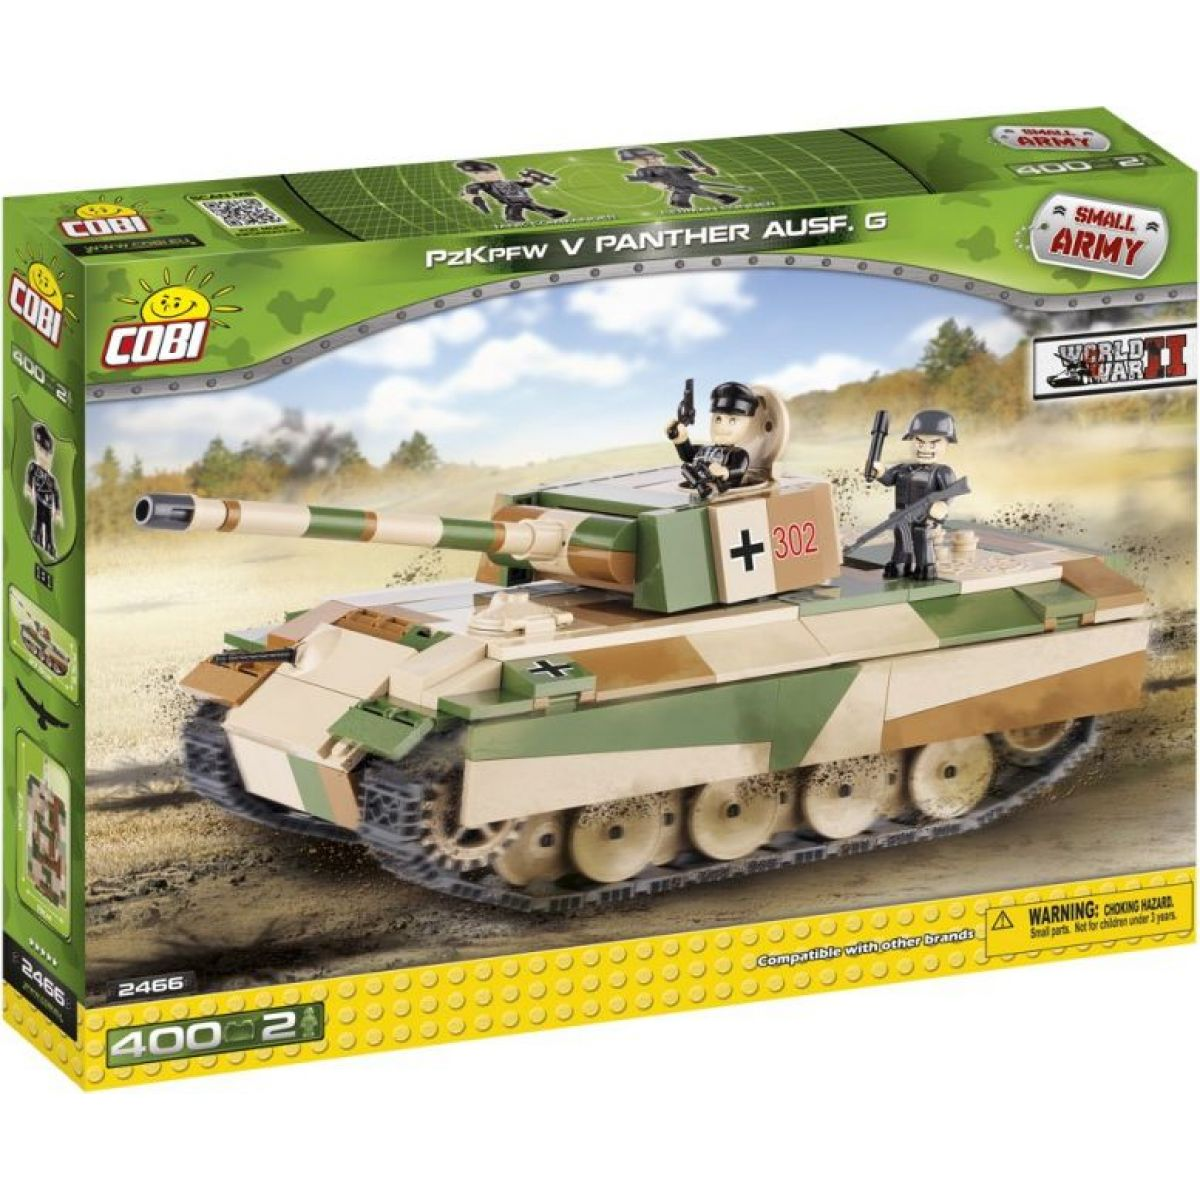 Cobi 2466 Malá armáda PzKpfw V Panther Ausf. G